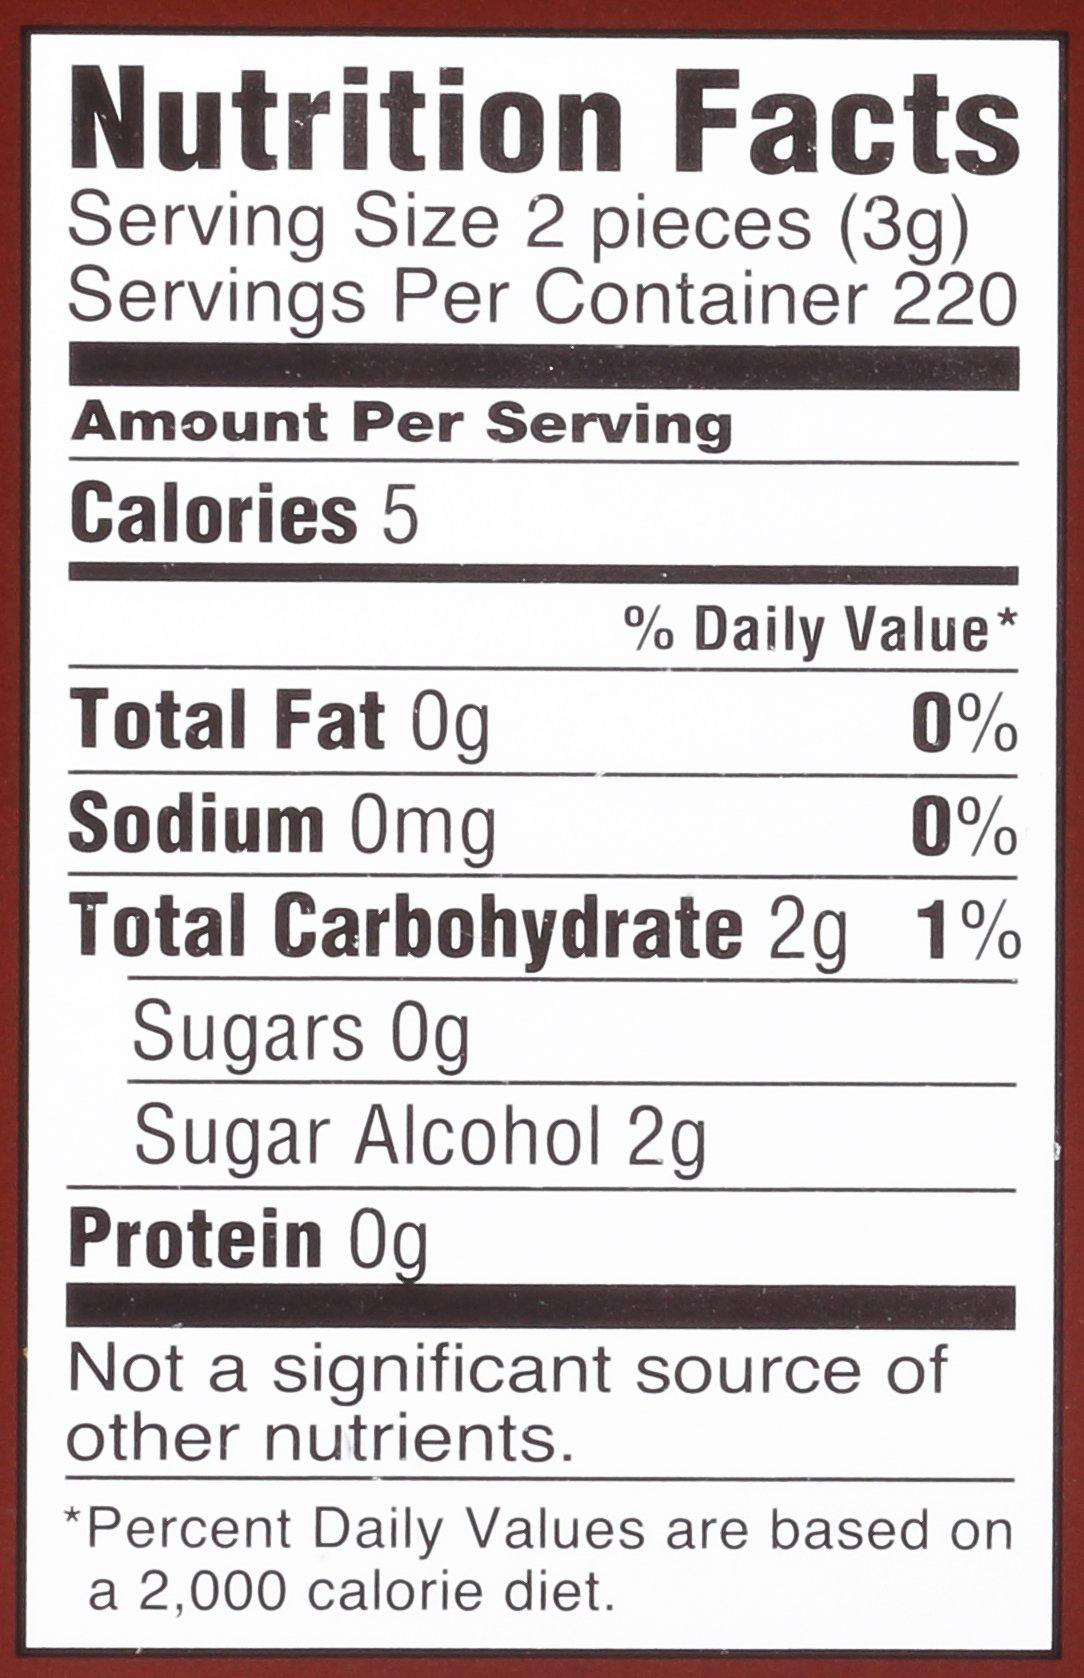 Dentyne Fire Spicy Cinnamon Sugar Free Chewing Gum Bag  110 Count (Pack of 4) by Dentyne